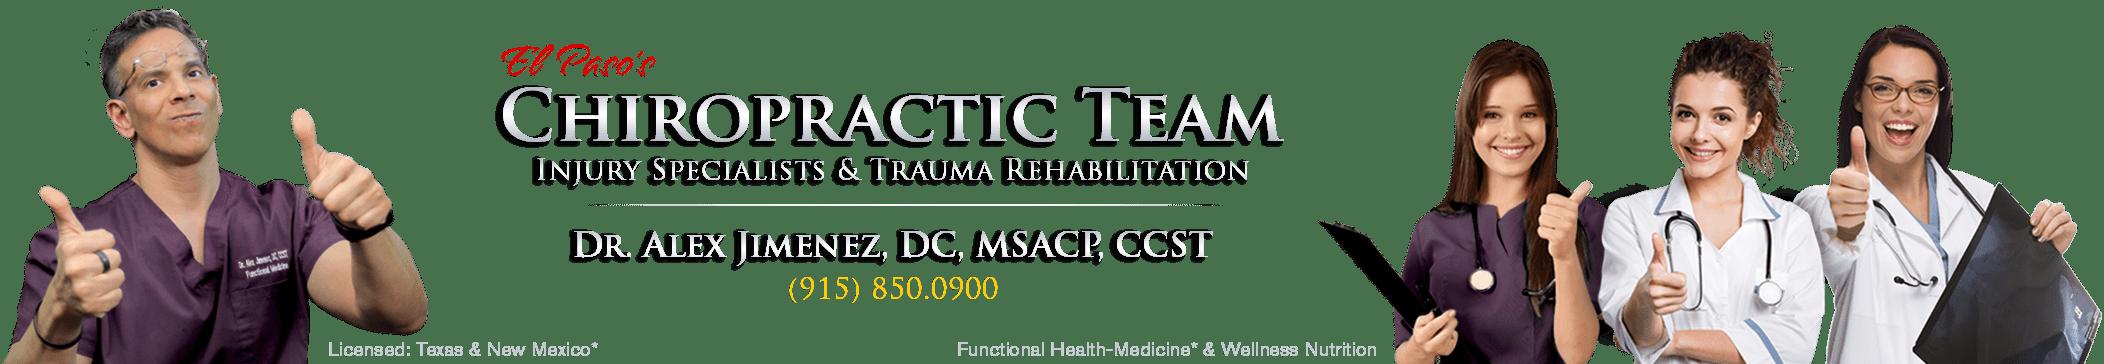 El Paso's Premier Chiropractic Clinic 915-850-0900